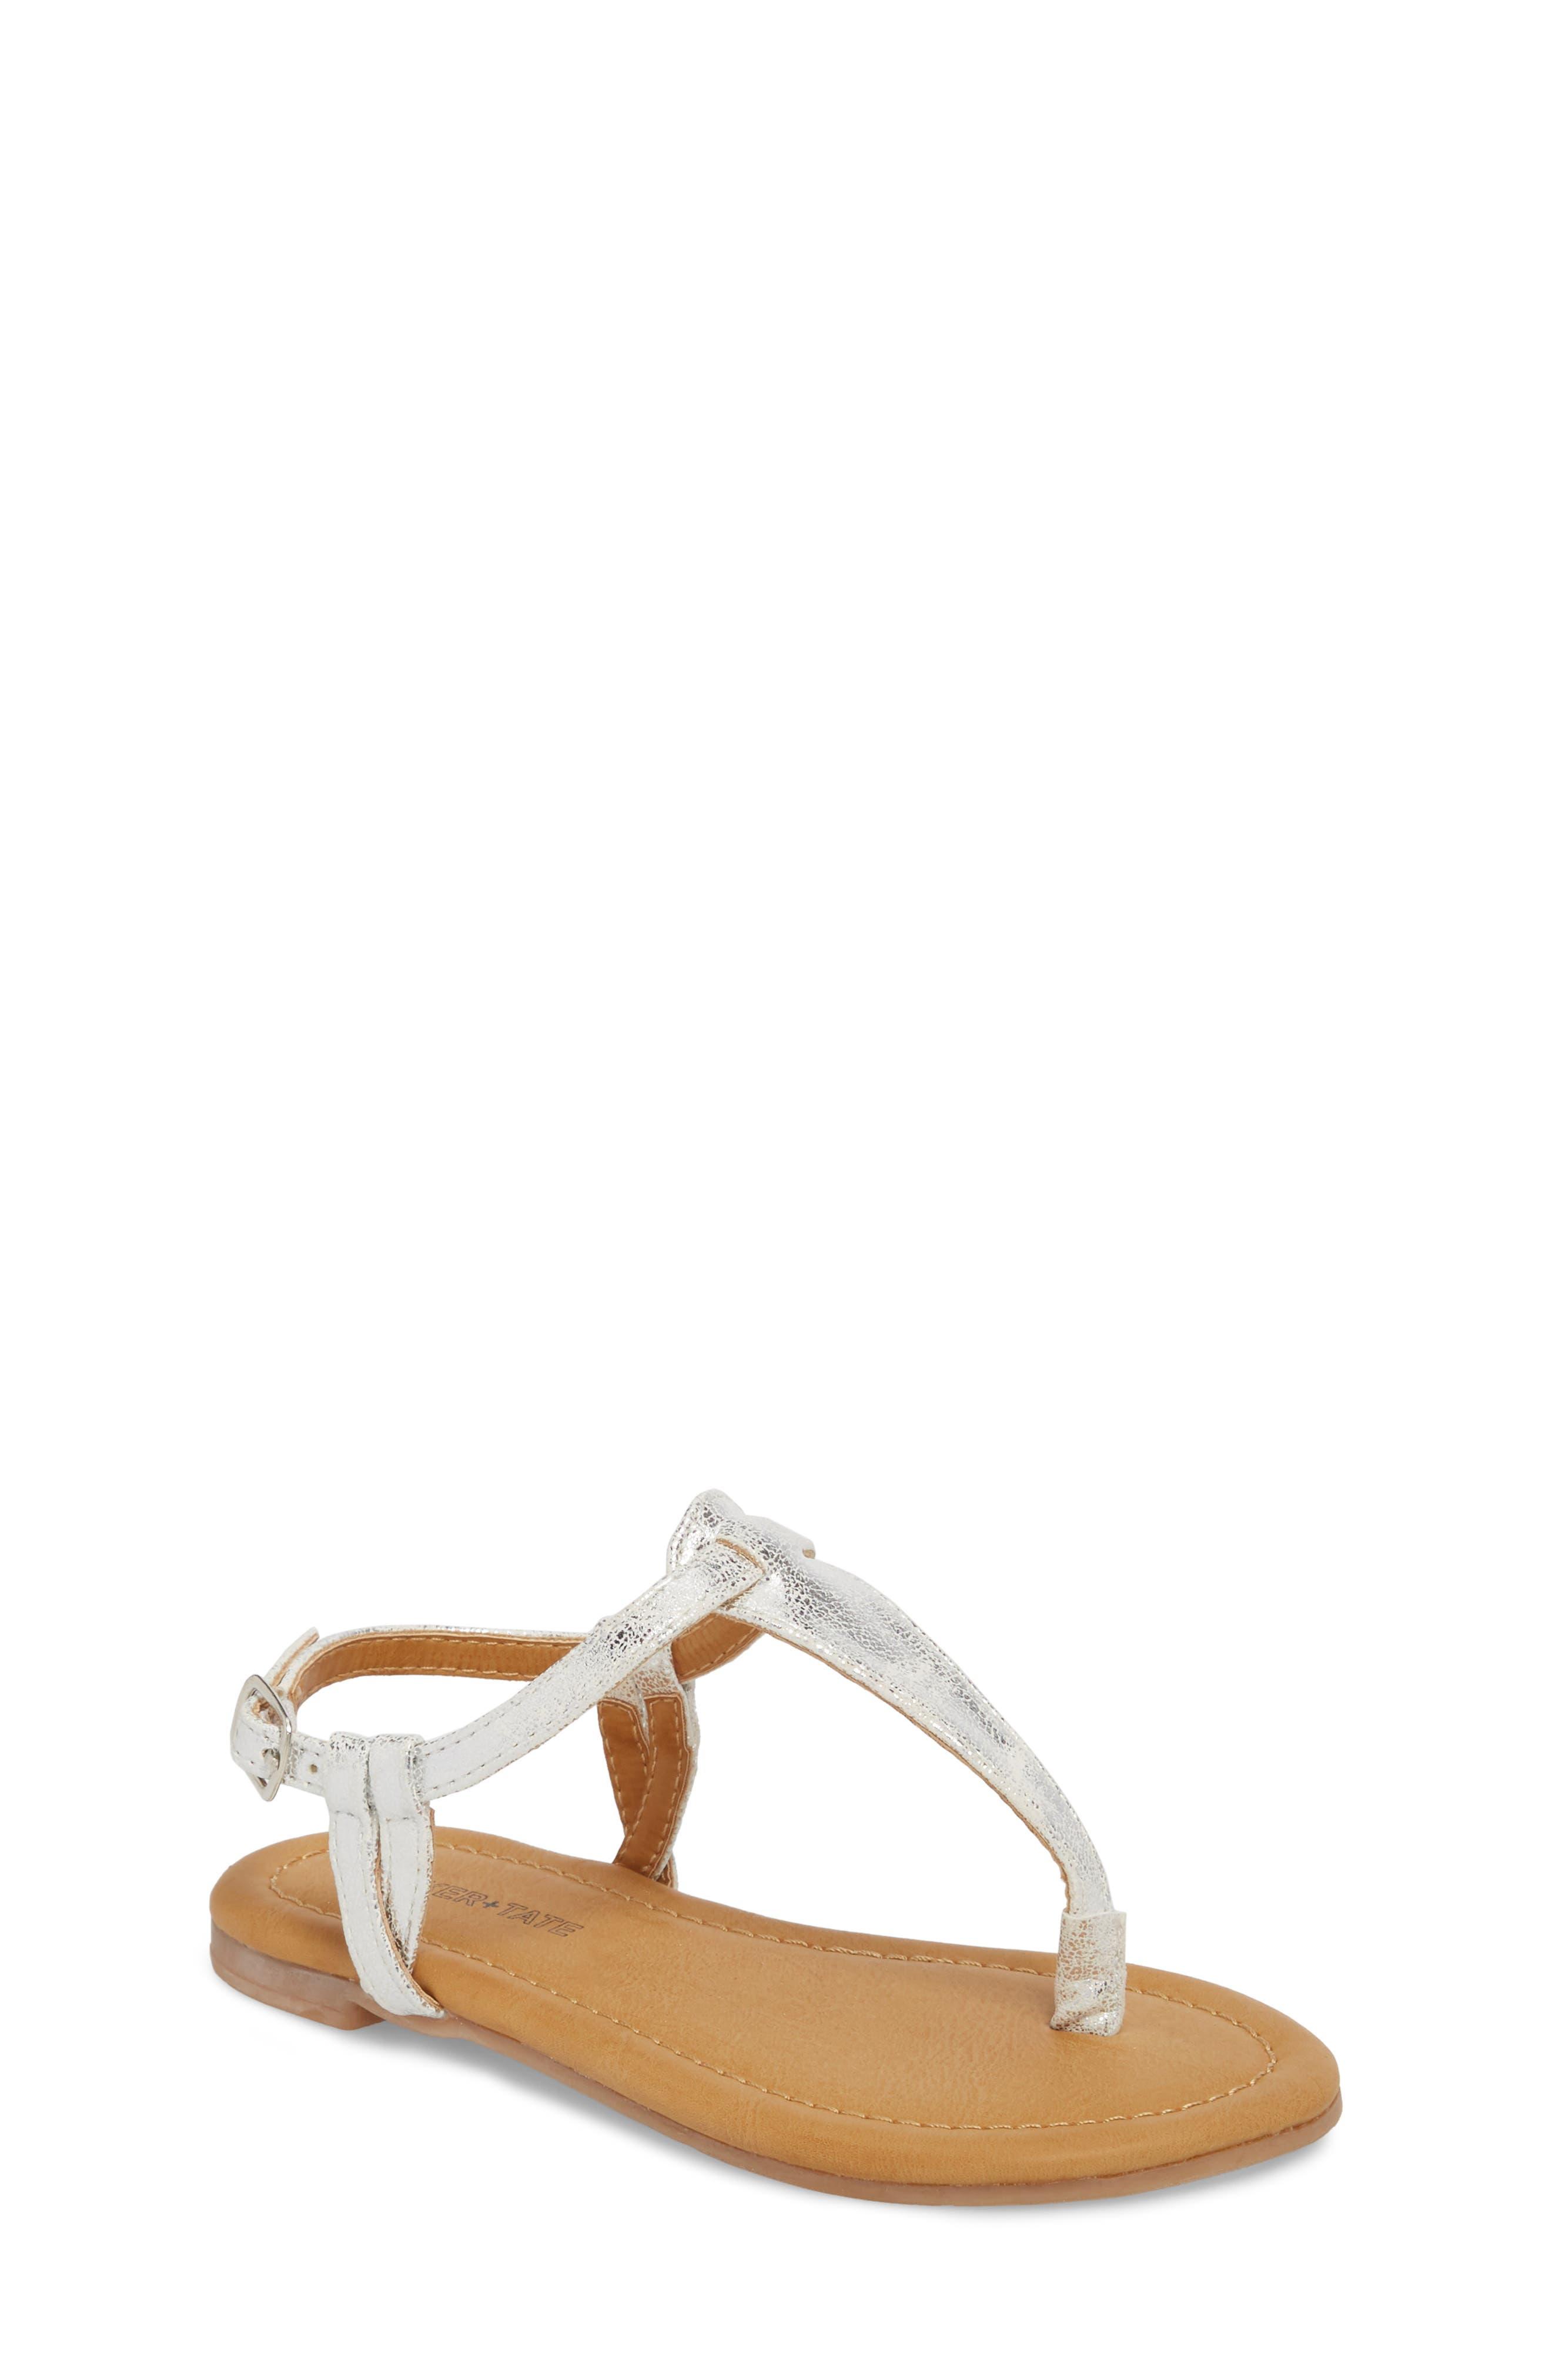 Lizzie Sandal,                         Main,                         color, White/ Silver Faux Leather